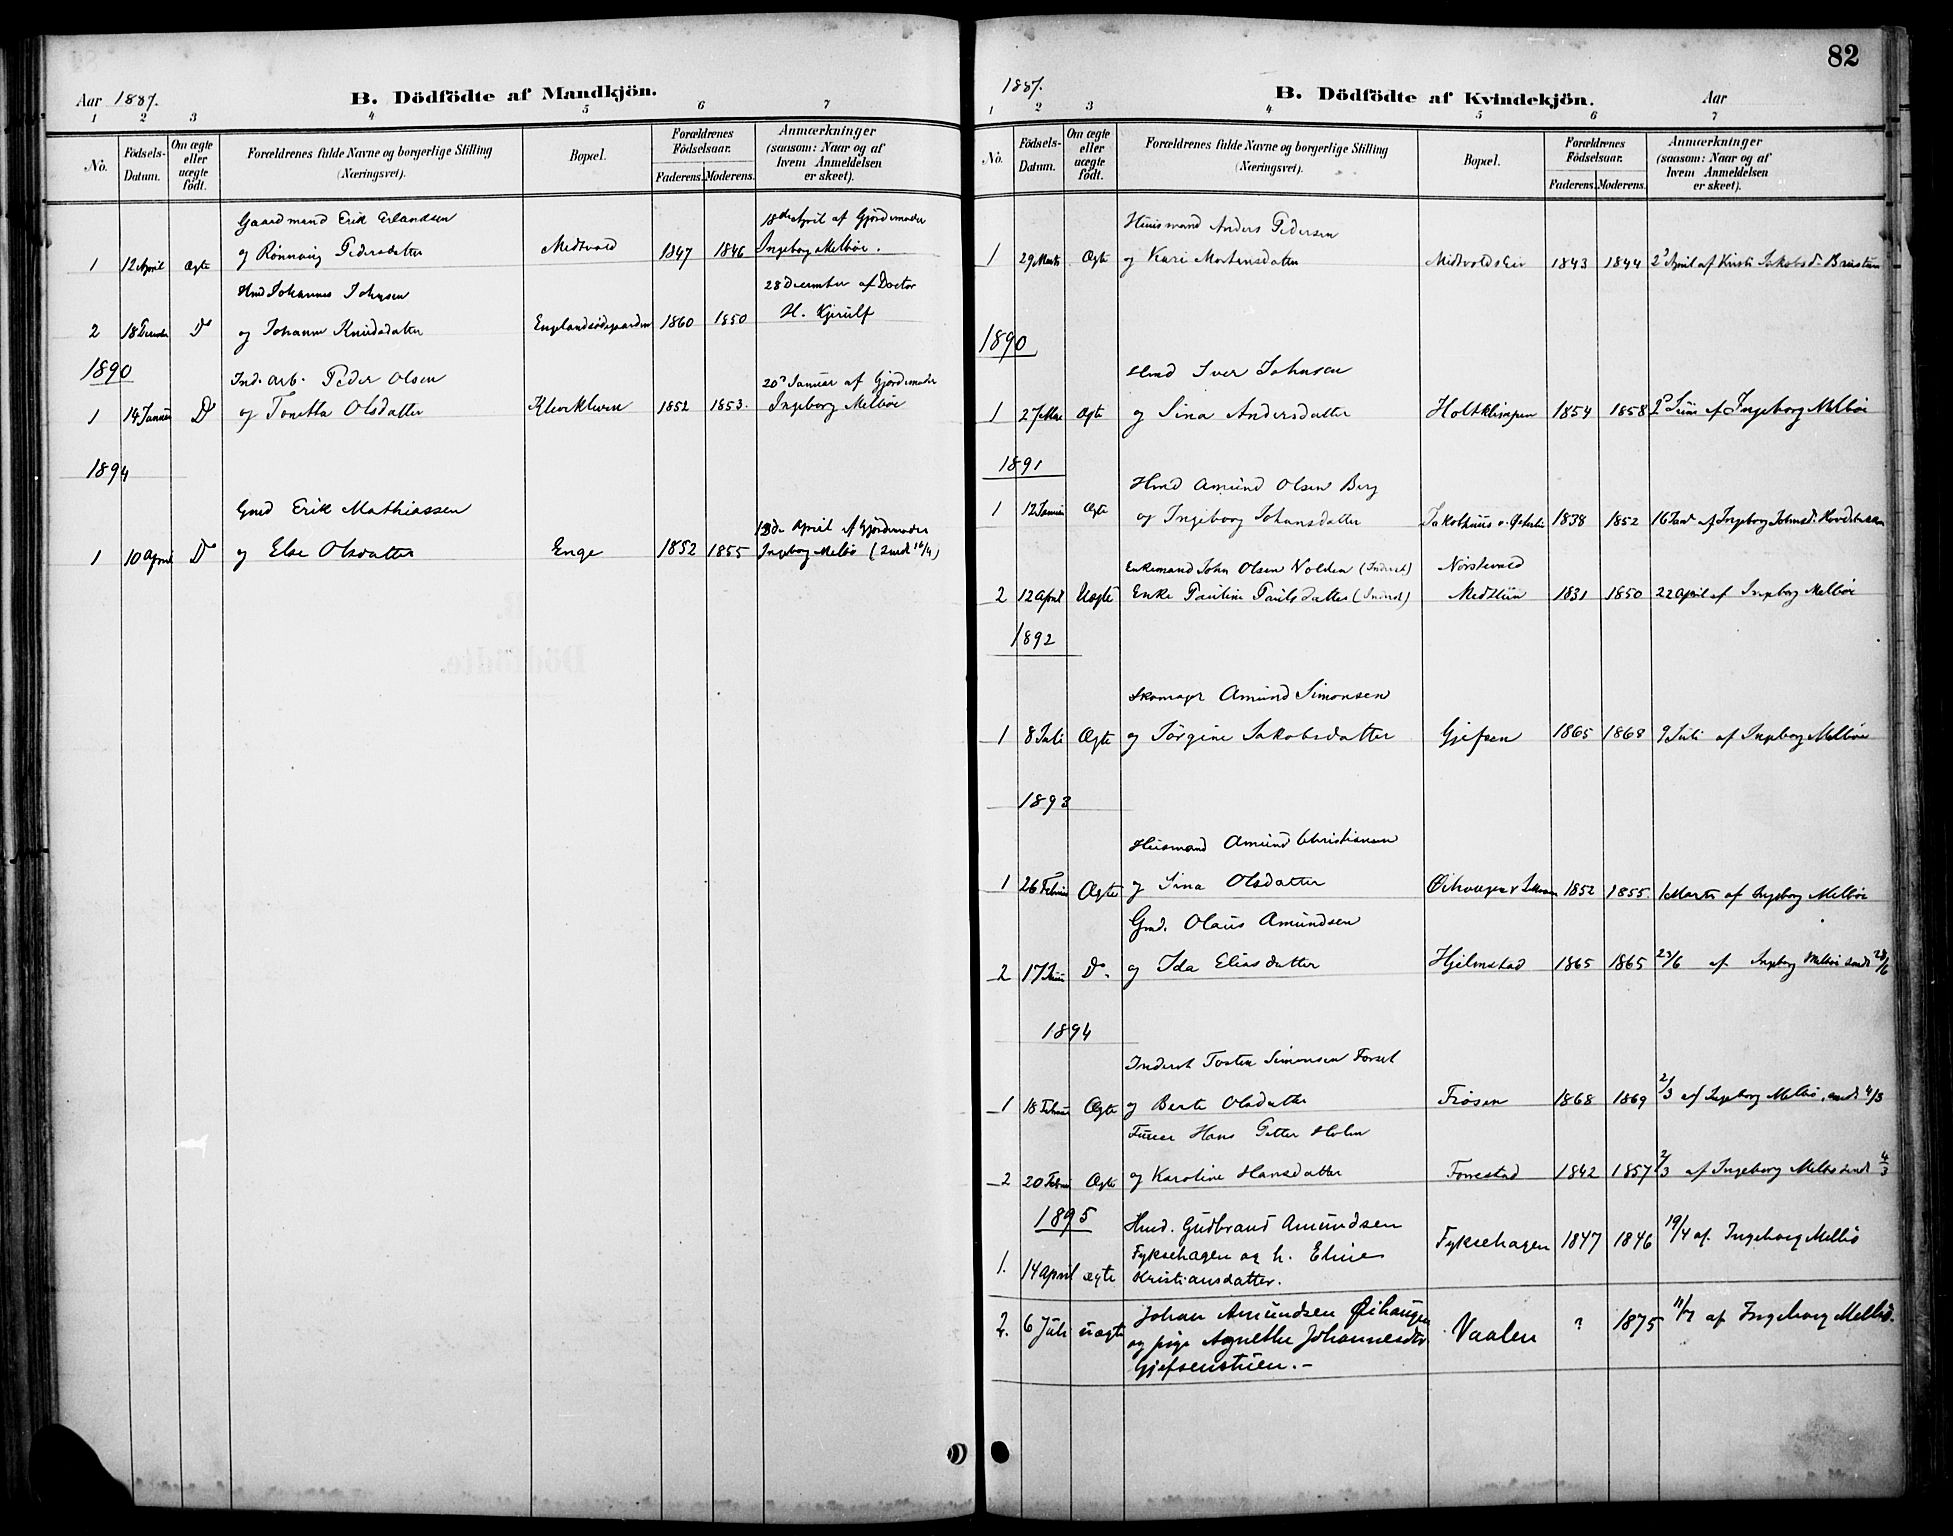 SAH, Østre Gausdal prestekontor, Ministerialbok nr. 2, 1887-1897, s. 82